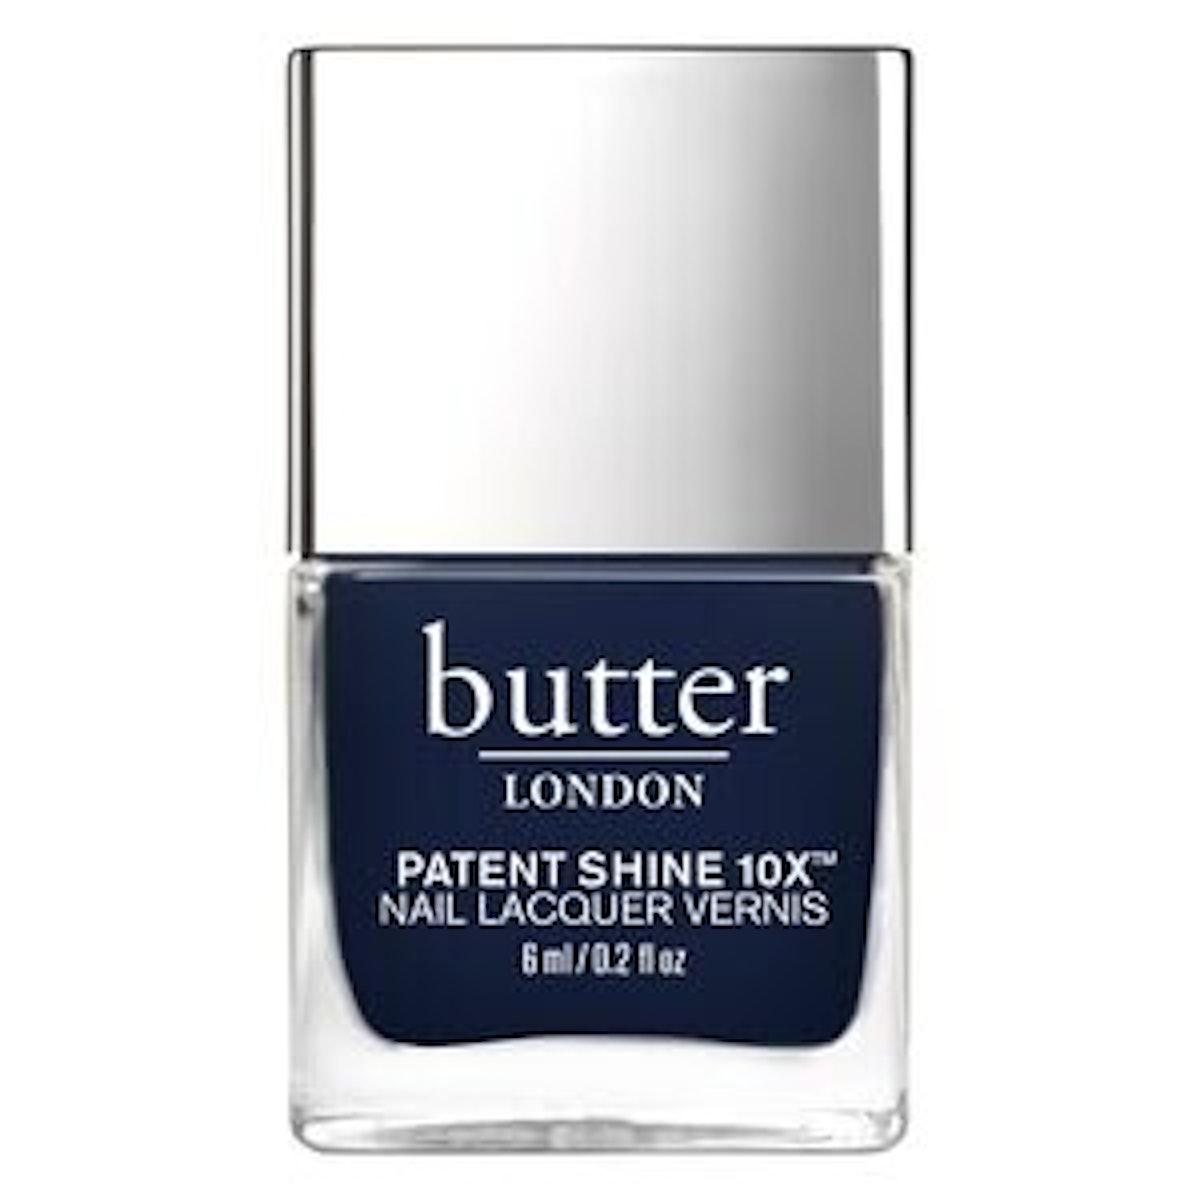 Patent Shine 10X Nail Lacquer